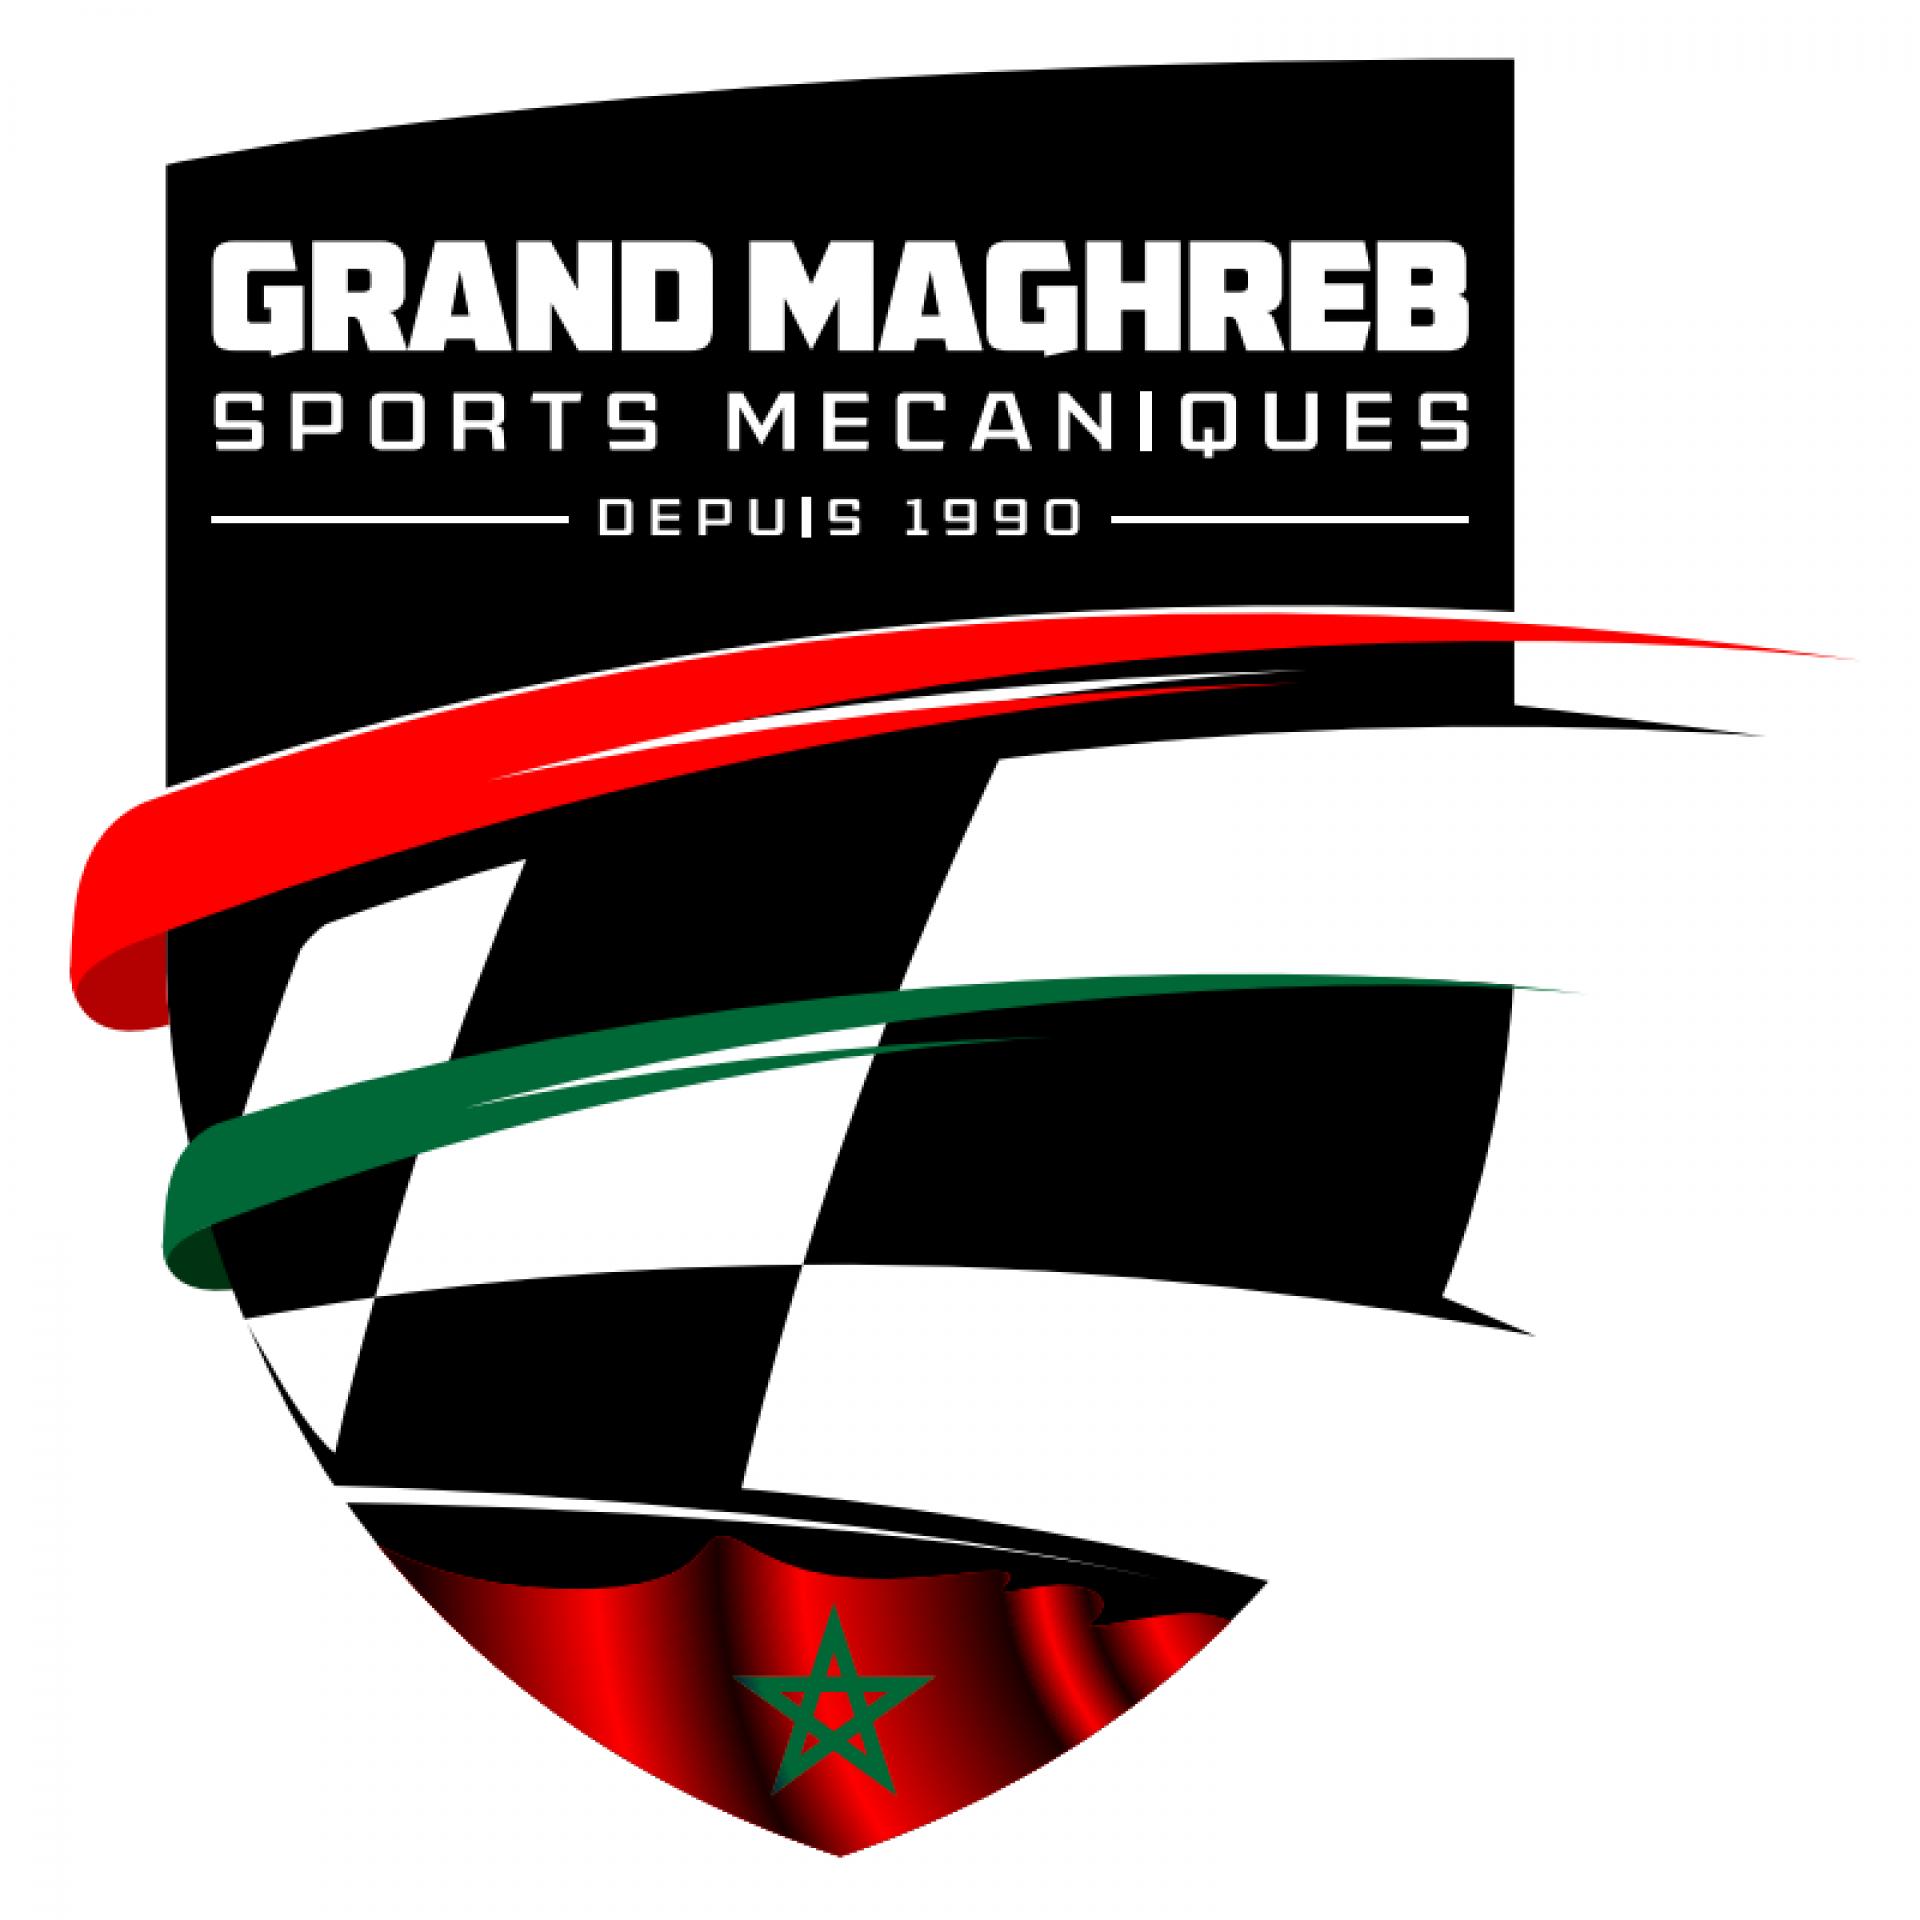 Club des sports mécaniques Le Grand Maghreb